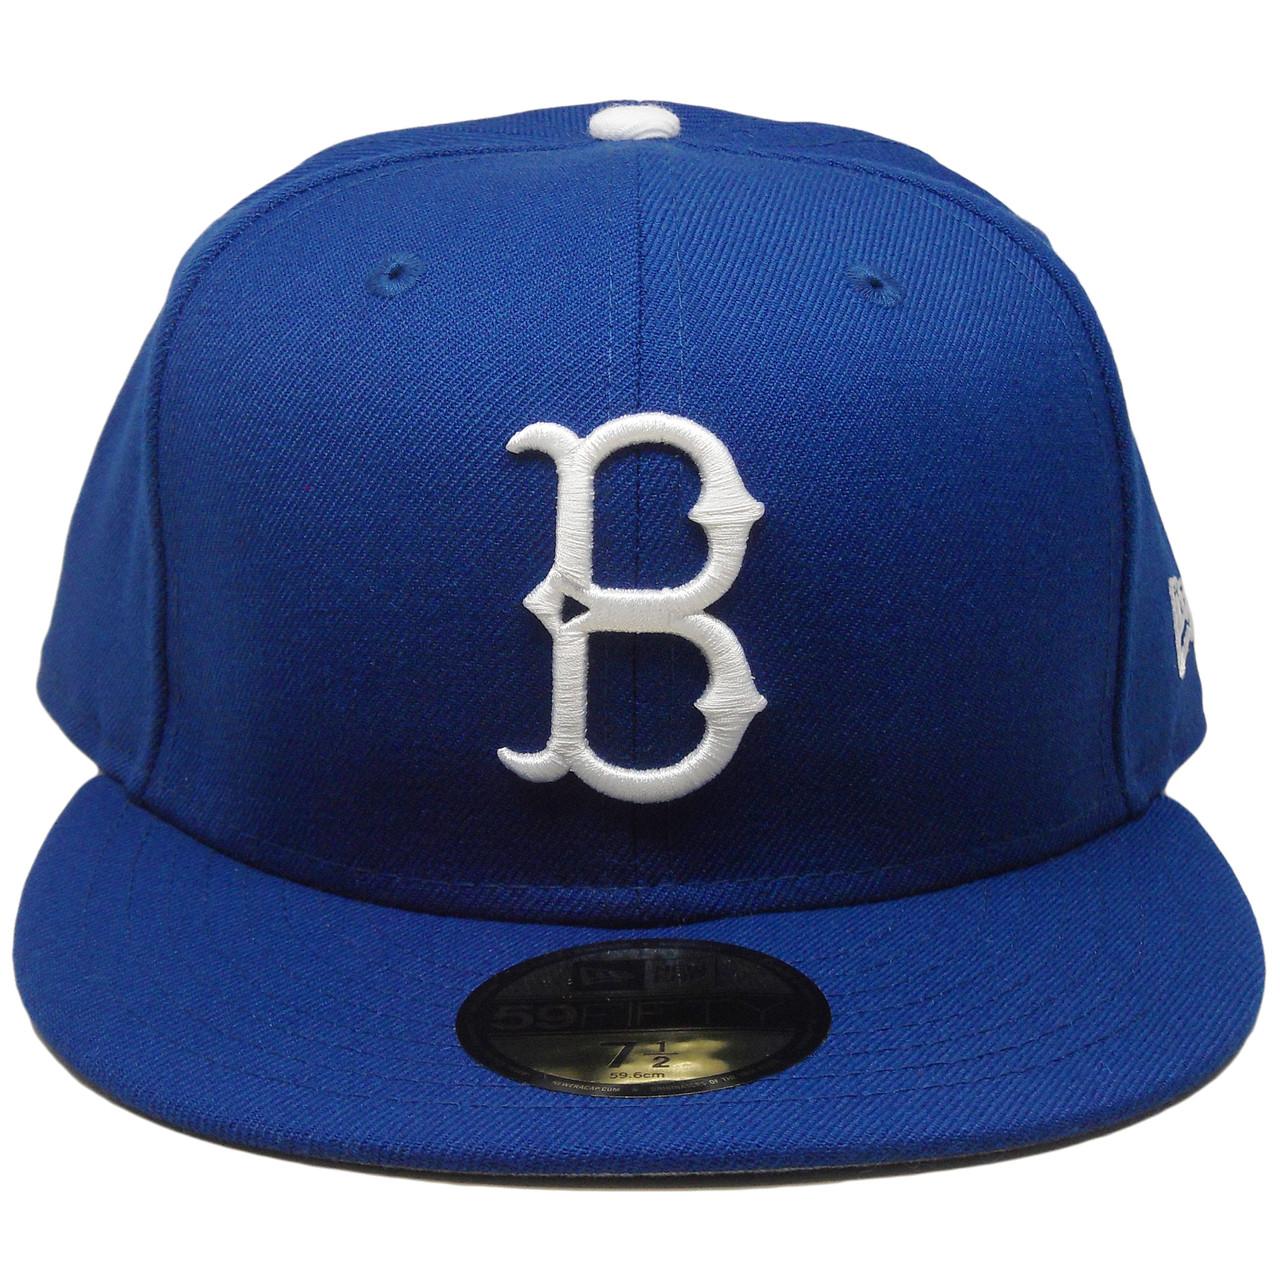 Brooklyn Dodgers Custom Gray Bottom 59Fifty Fitted Hat - Royal ... 42db64520fa5